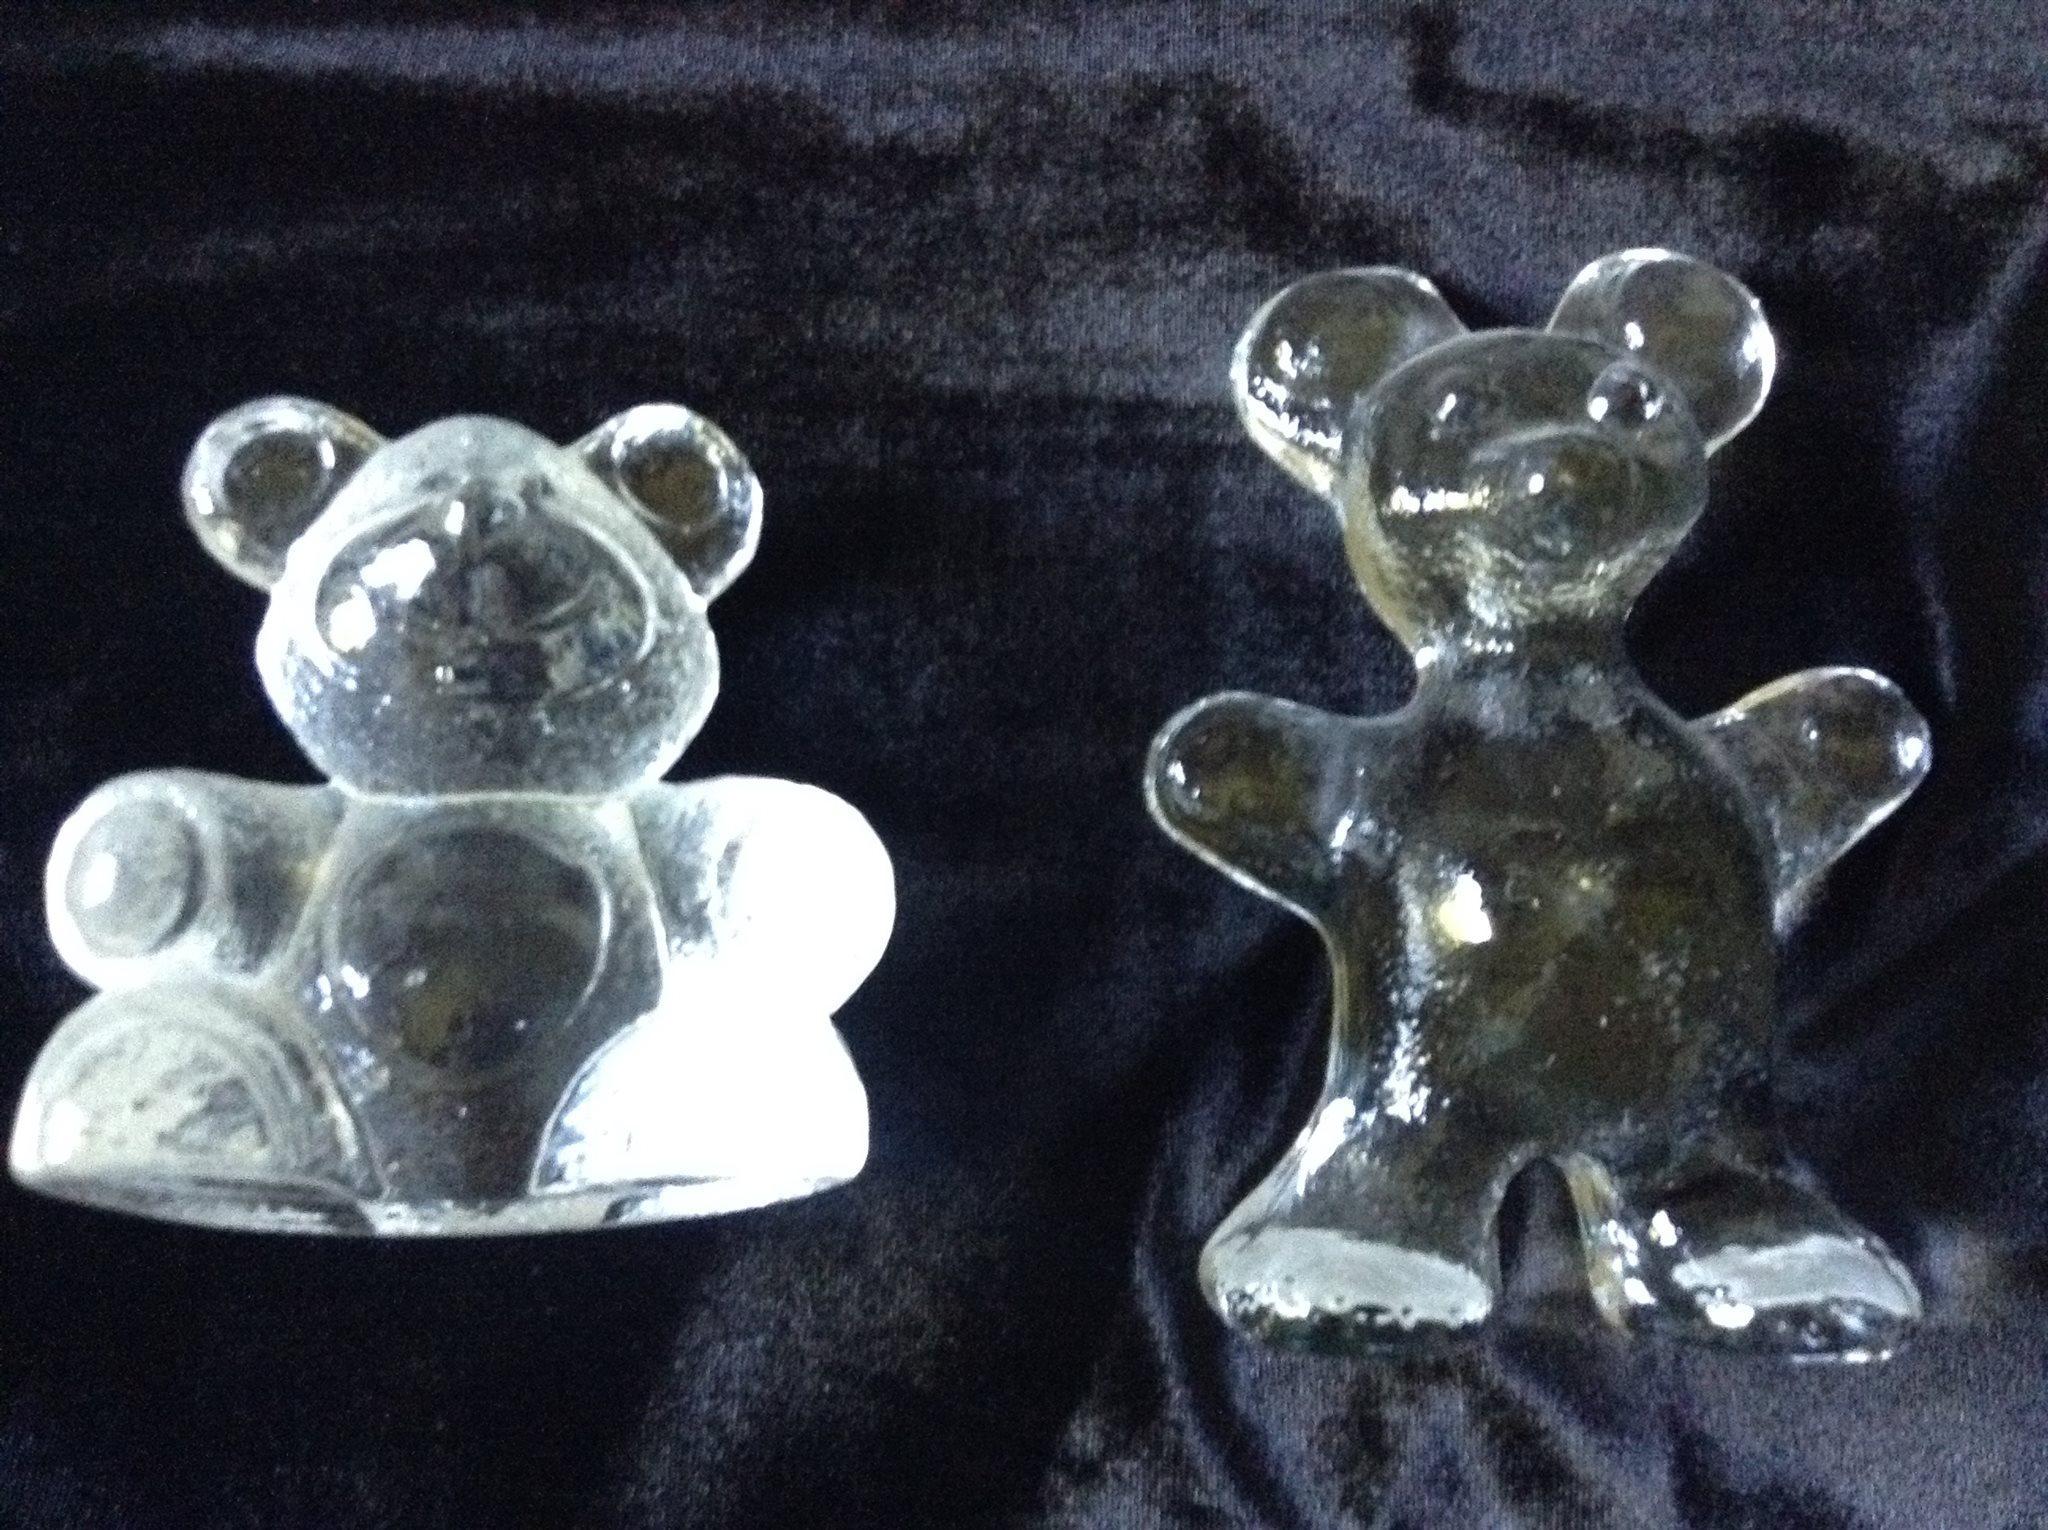 2 st Nalle i glas Glasfigur Björn (350864659) u1408 Köp på Tradera